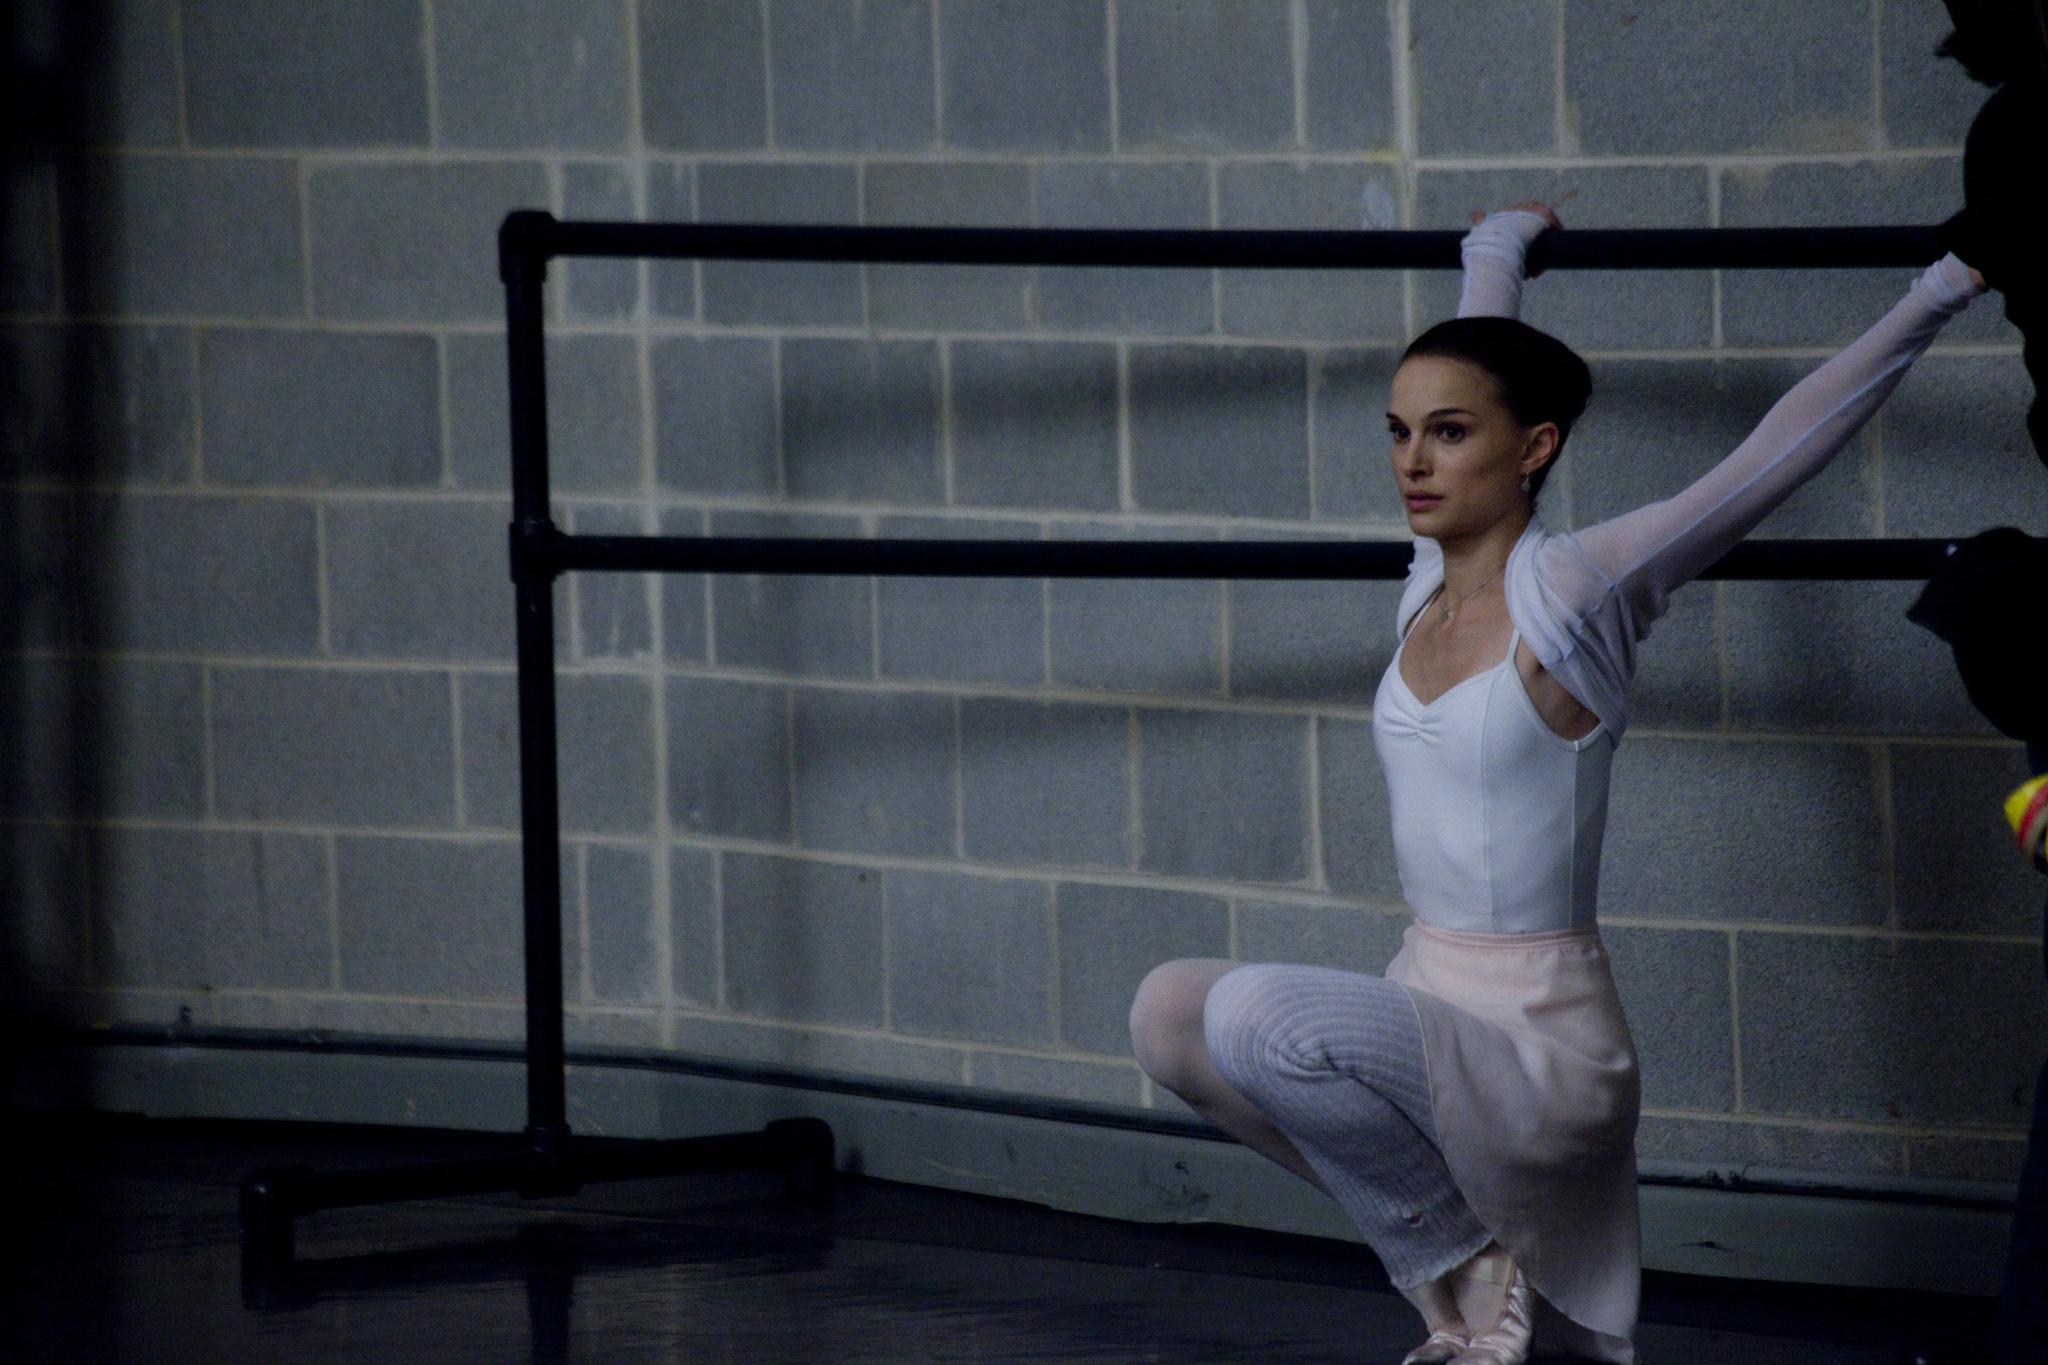 Black Swan | Best Hollywood Psychological Thriller Movies